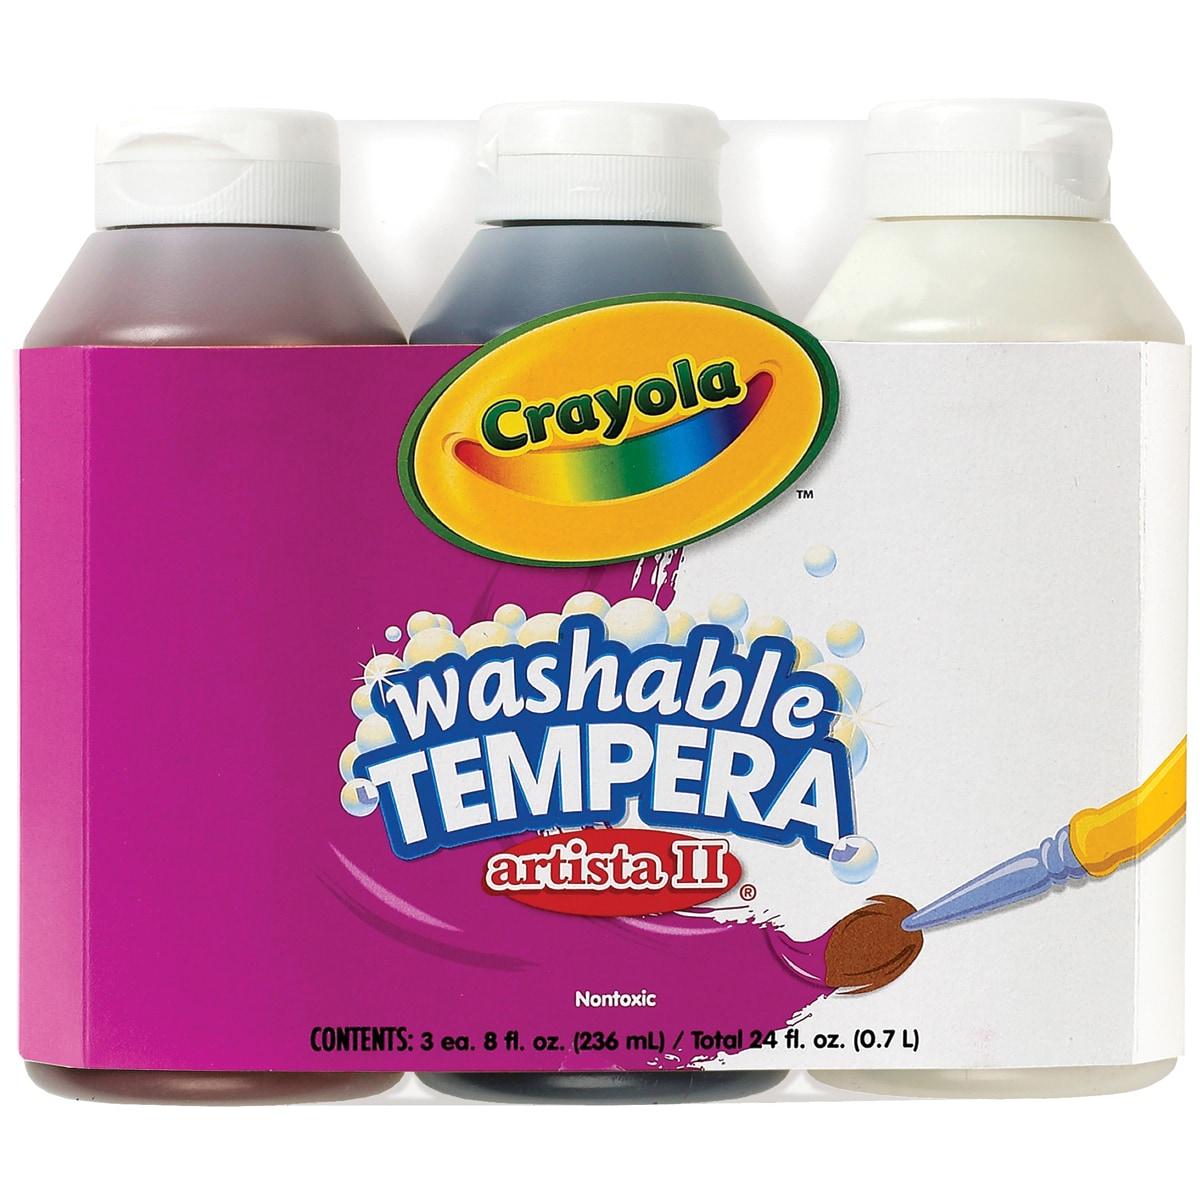 Crayola Artista II Washable Tempera Paint 8oz 3/PkgNeutra...